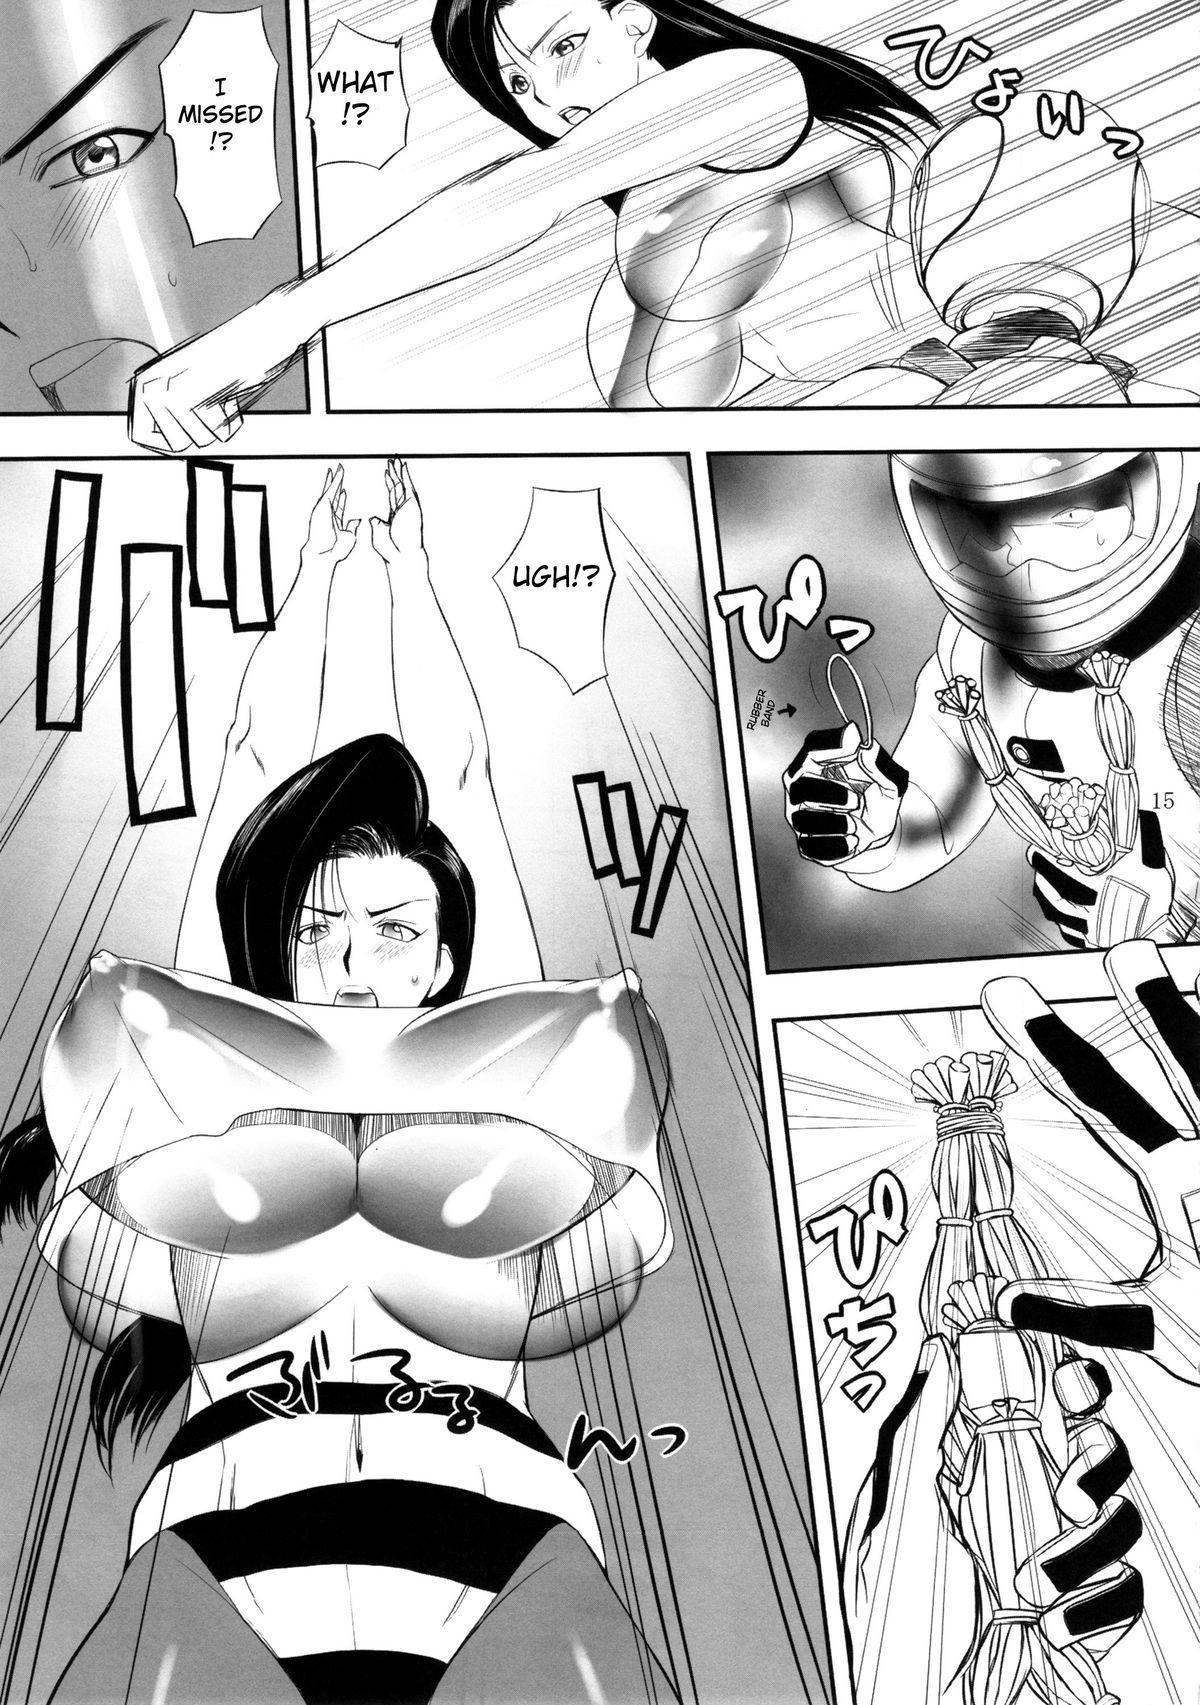 (COMIC1☆8) [G-panda (Midoh Tsukasa)] Maji kayo!? Ooaya-sensei   I Can't Believe It! Ooaya-sensei (Magical Taruruuto-kun) [English] {doujin-moe.us} 13